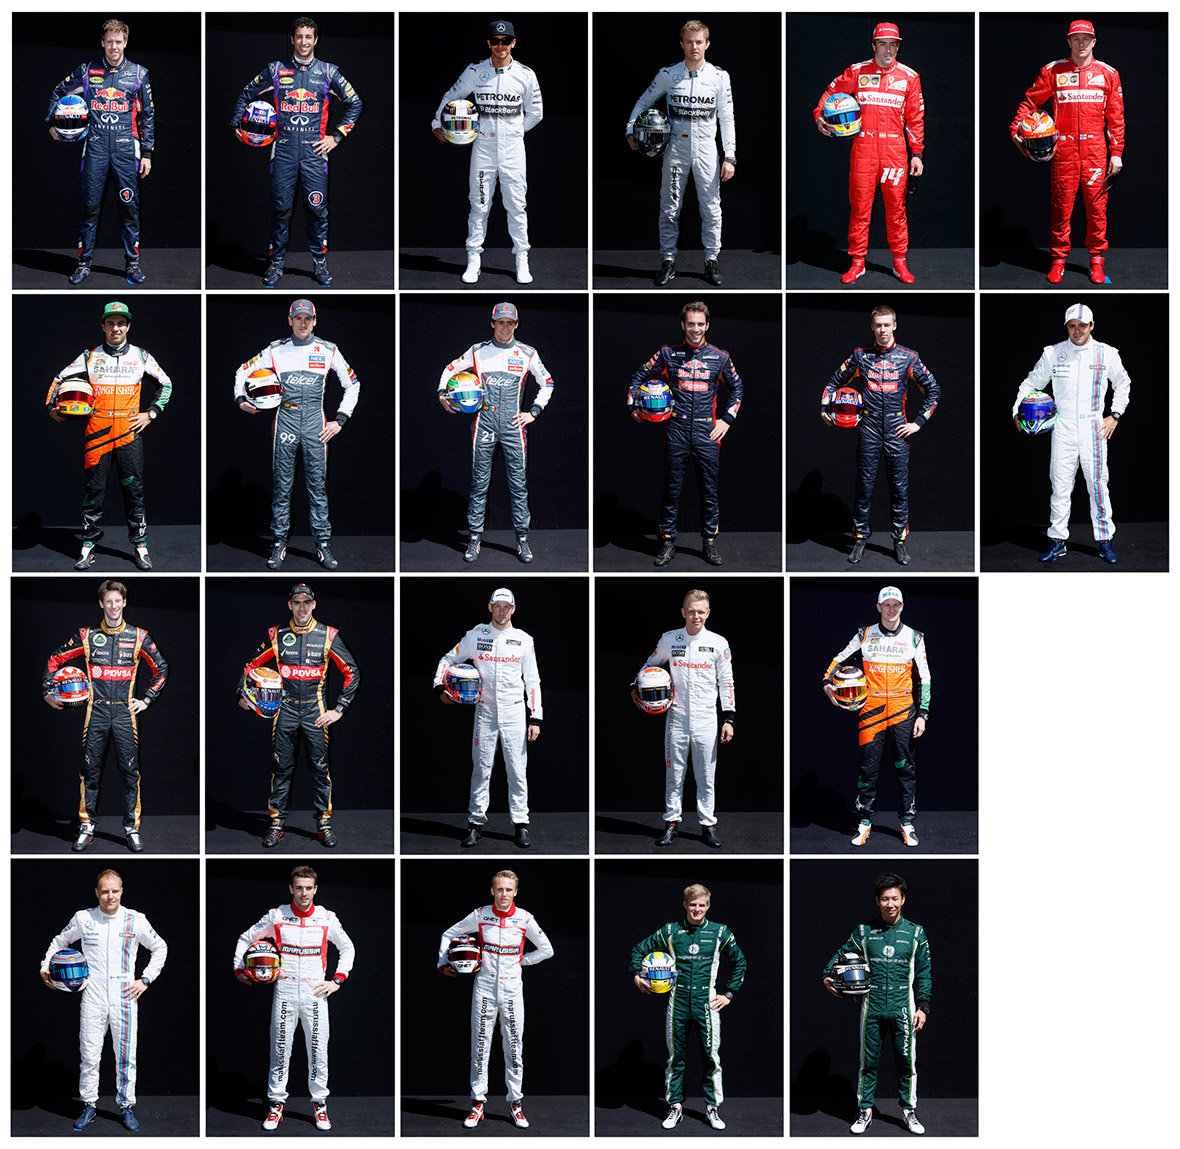 f1 uniforms